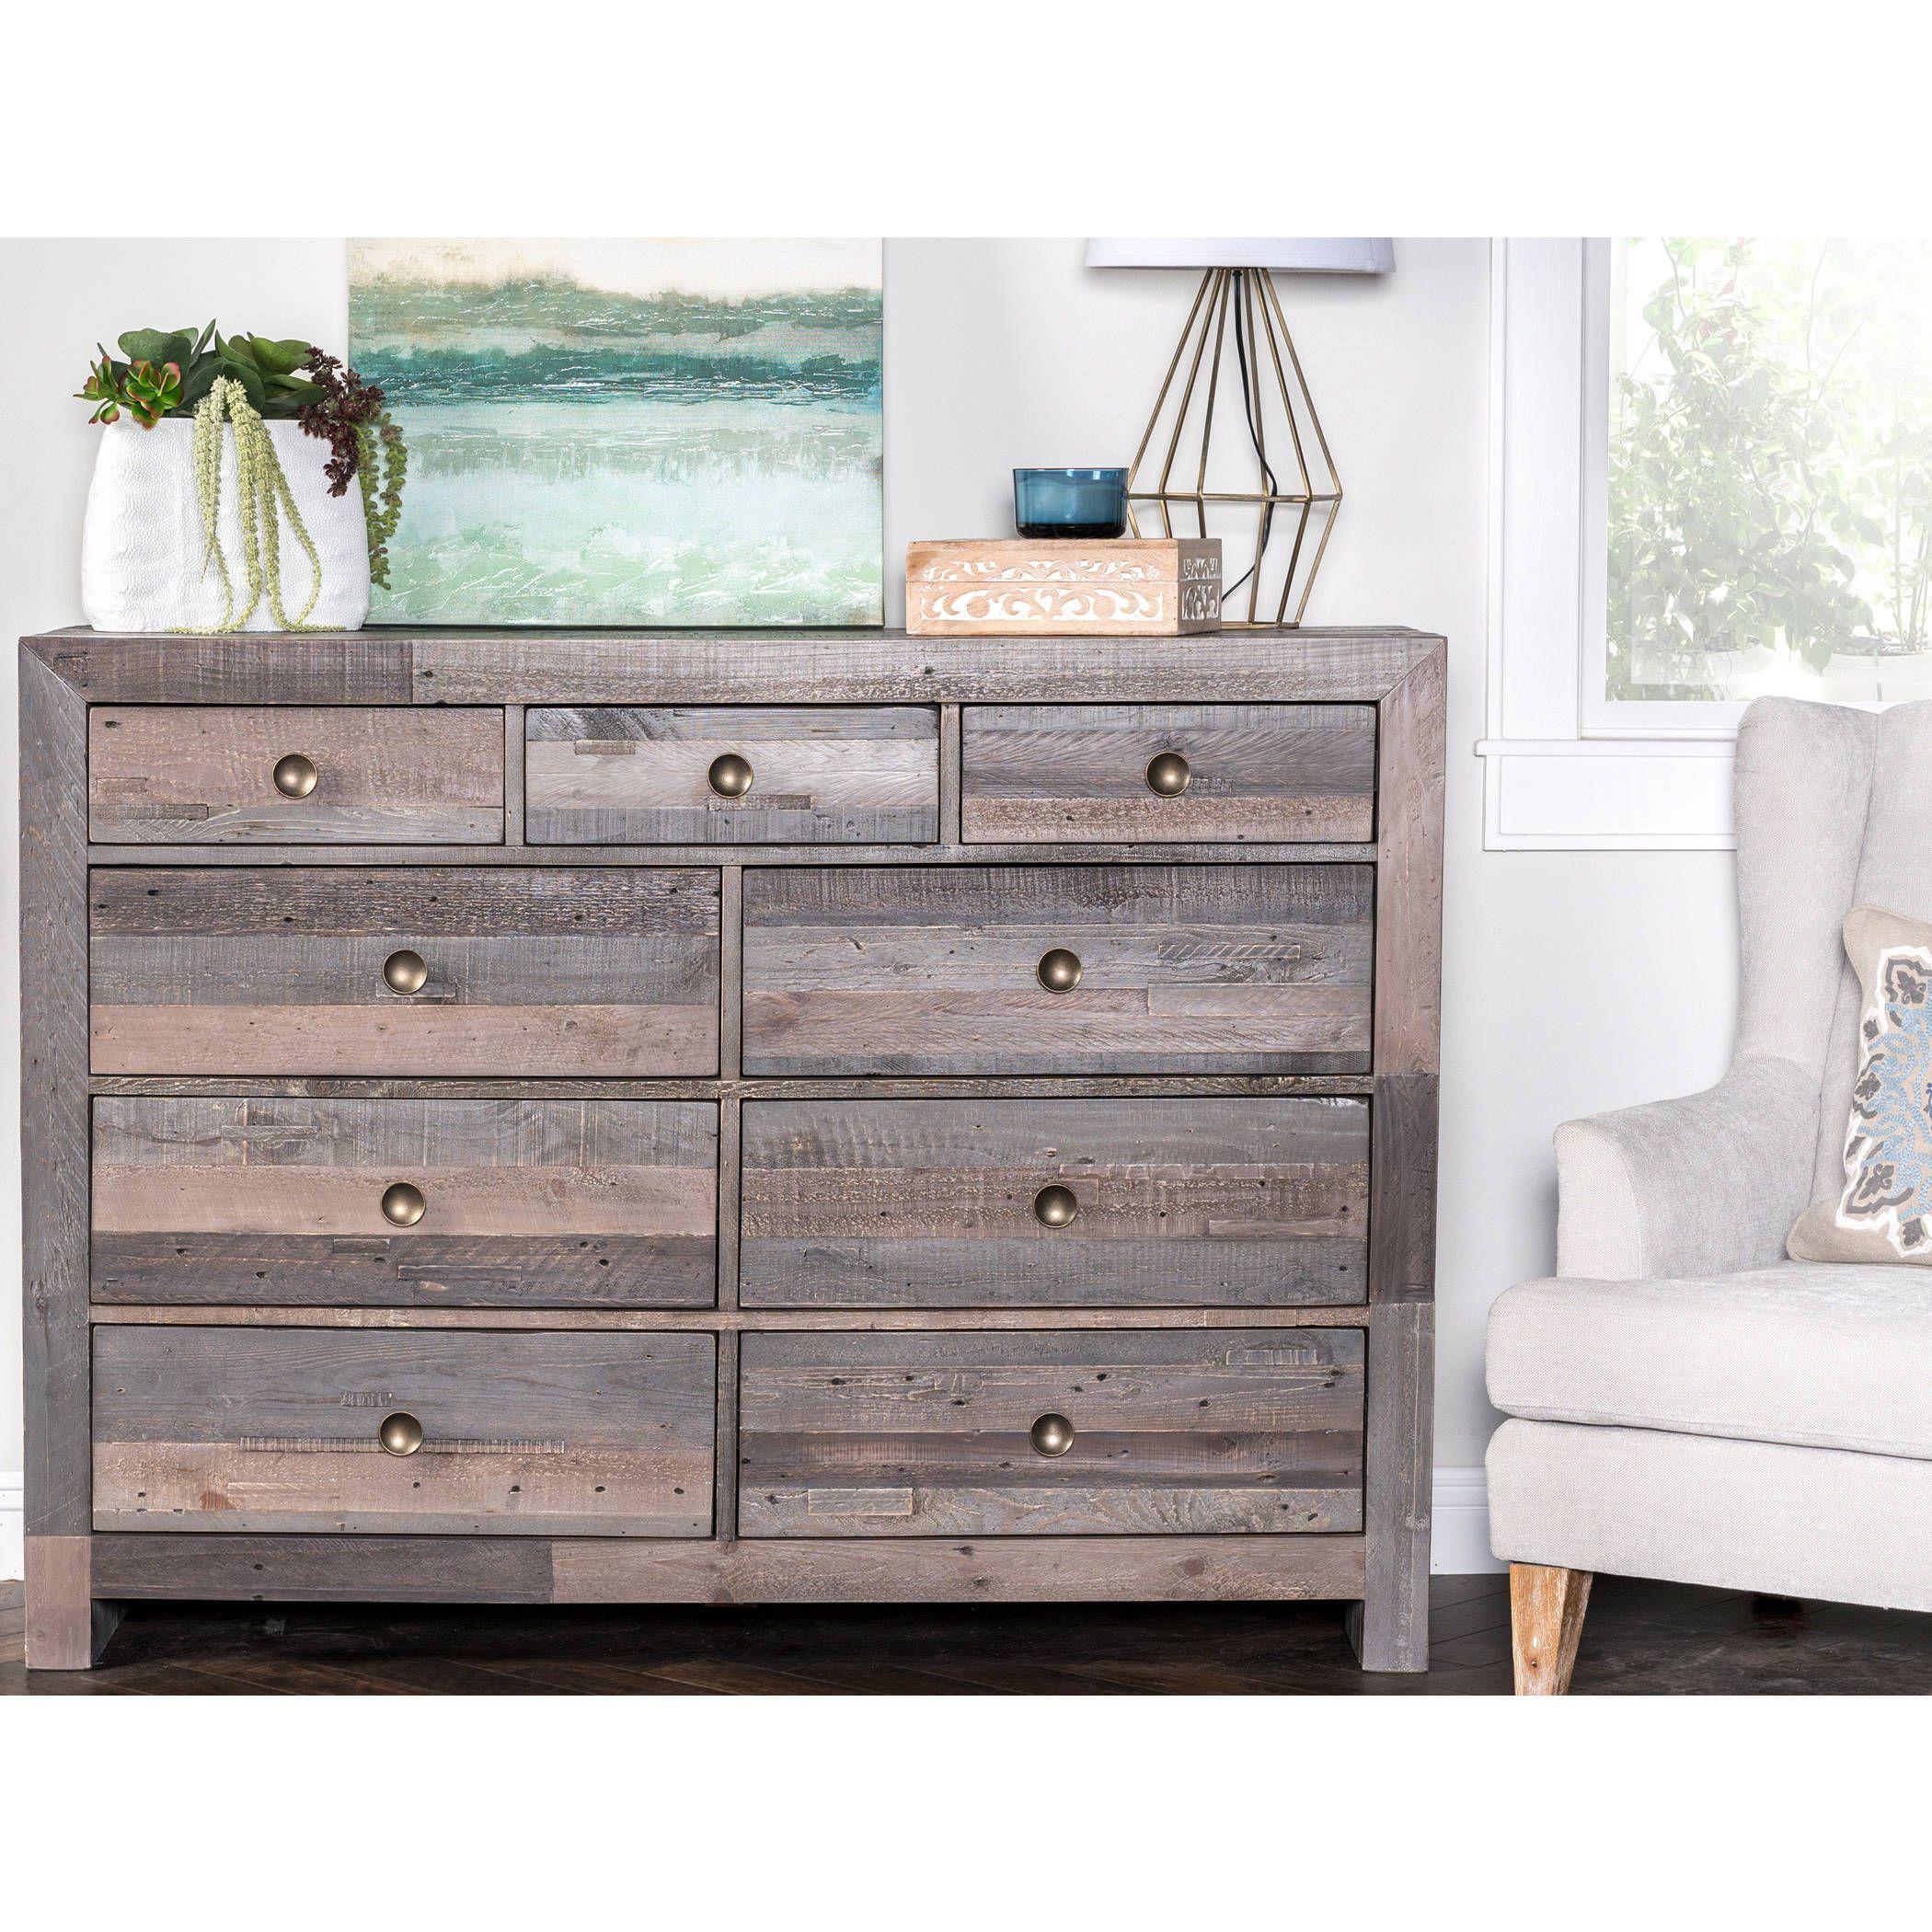 oscar reclaimed wood dresser by kosas home